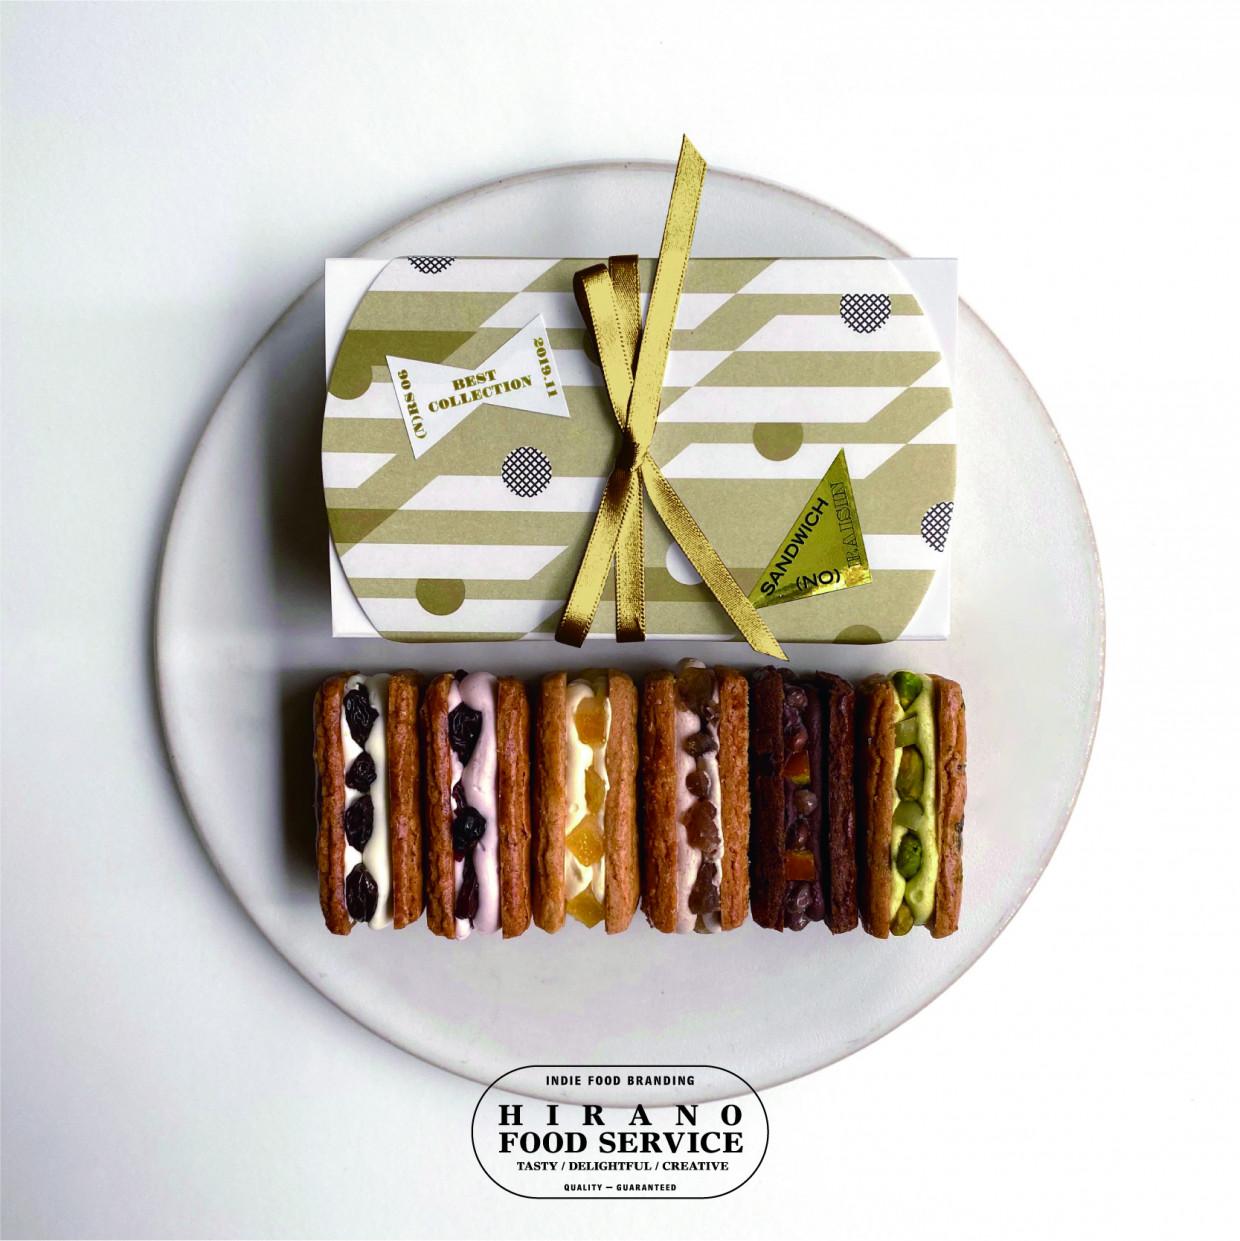 "平原紗季子的食物獨立商標標簽""HIRANO FOOD SERVICE"""